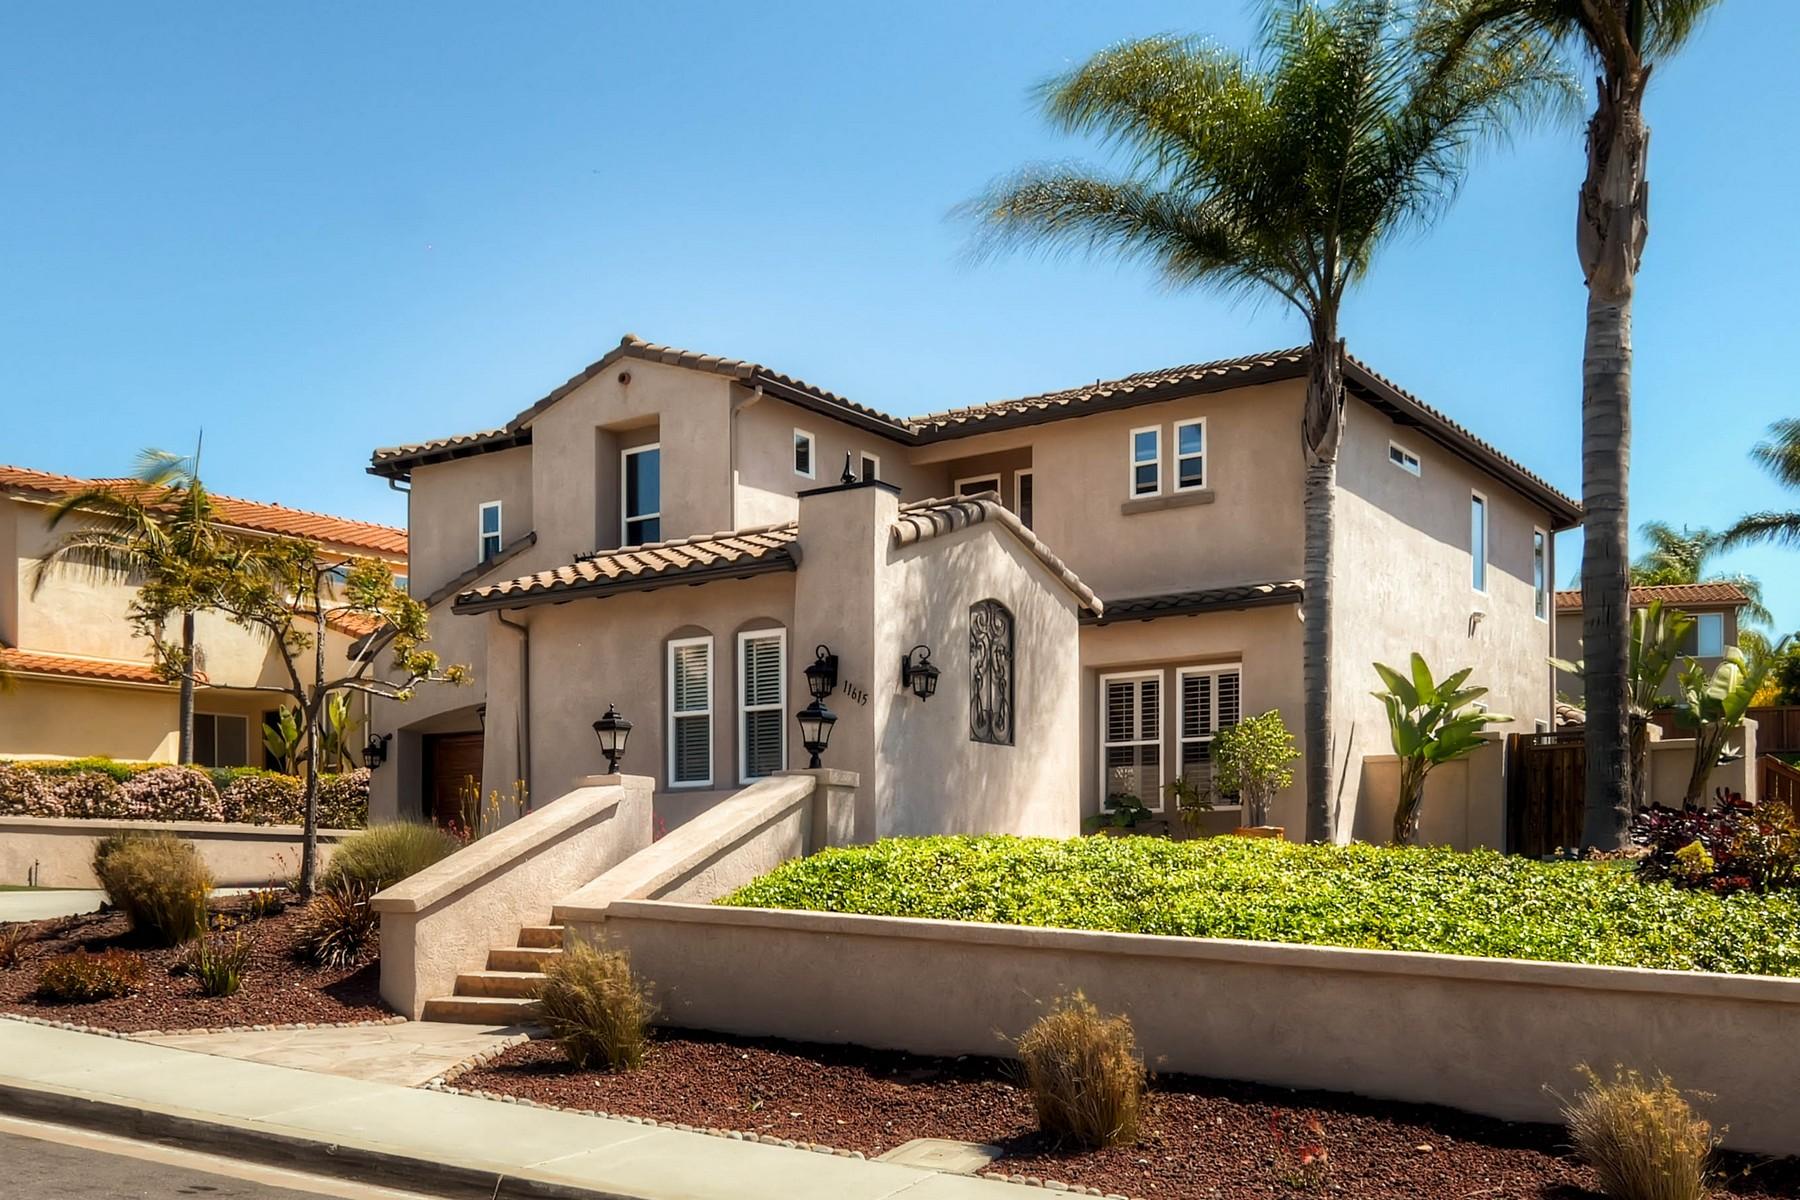 Single Family Home for Sale at 11615 Alderhill San Diego, California 92131 United States